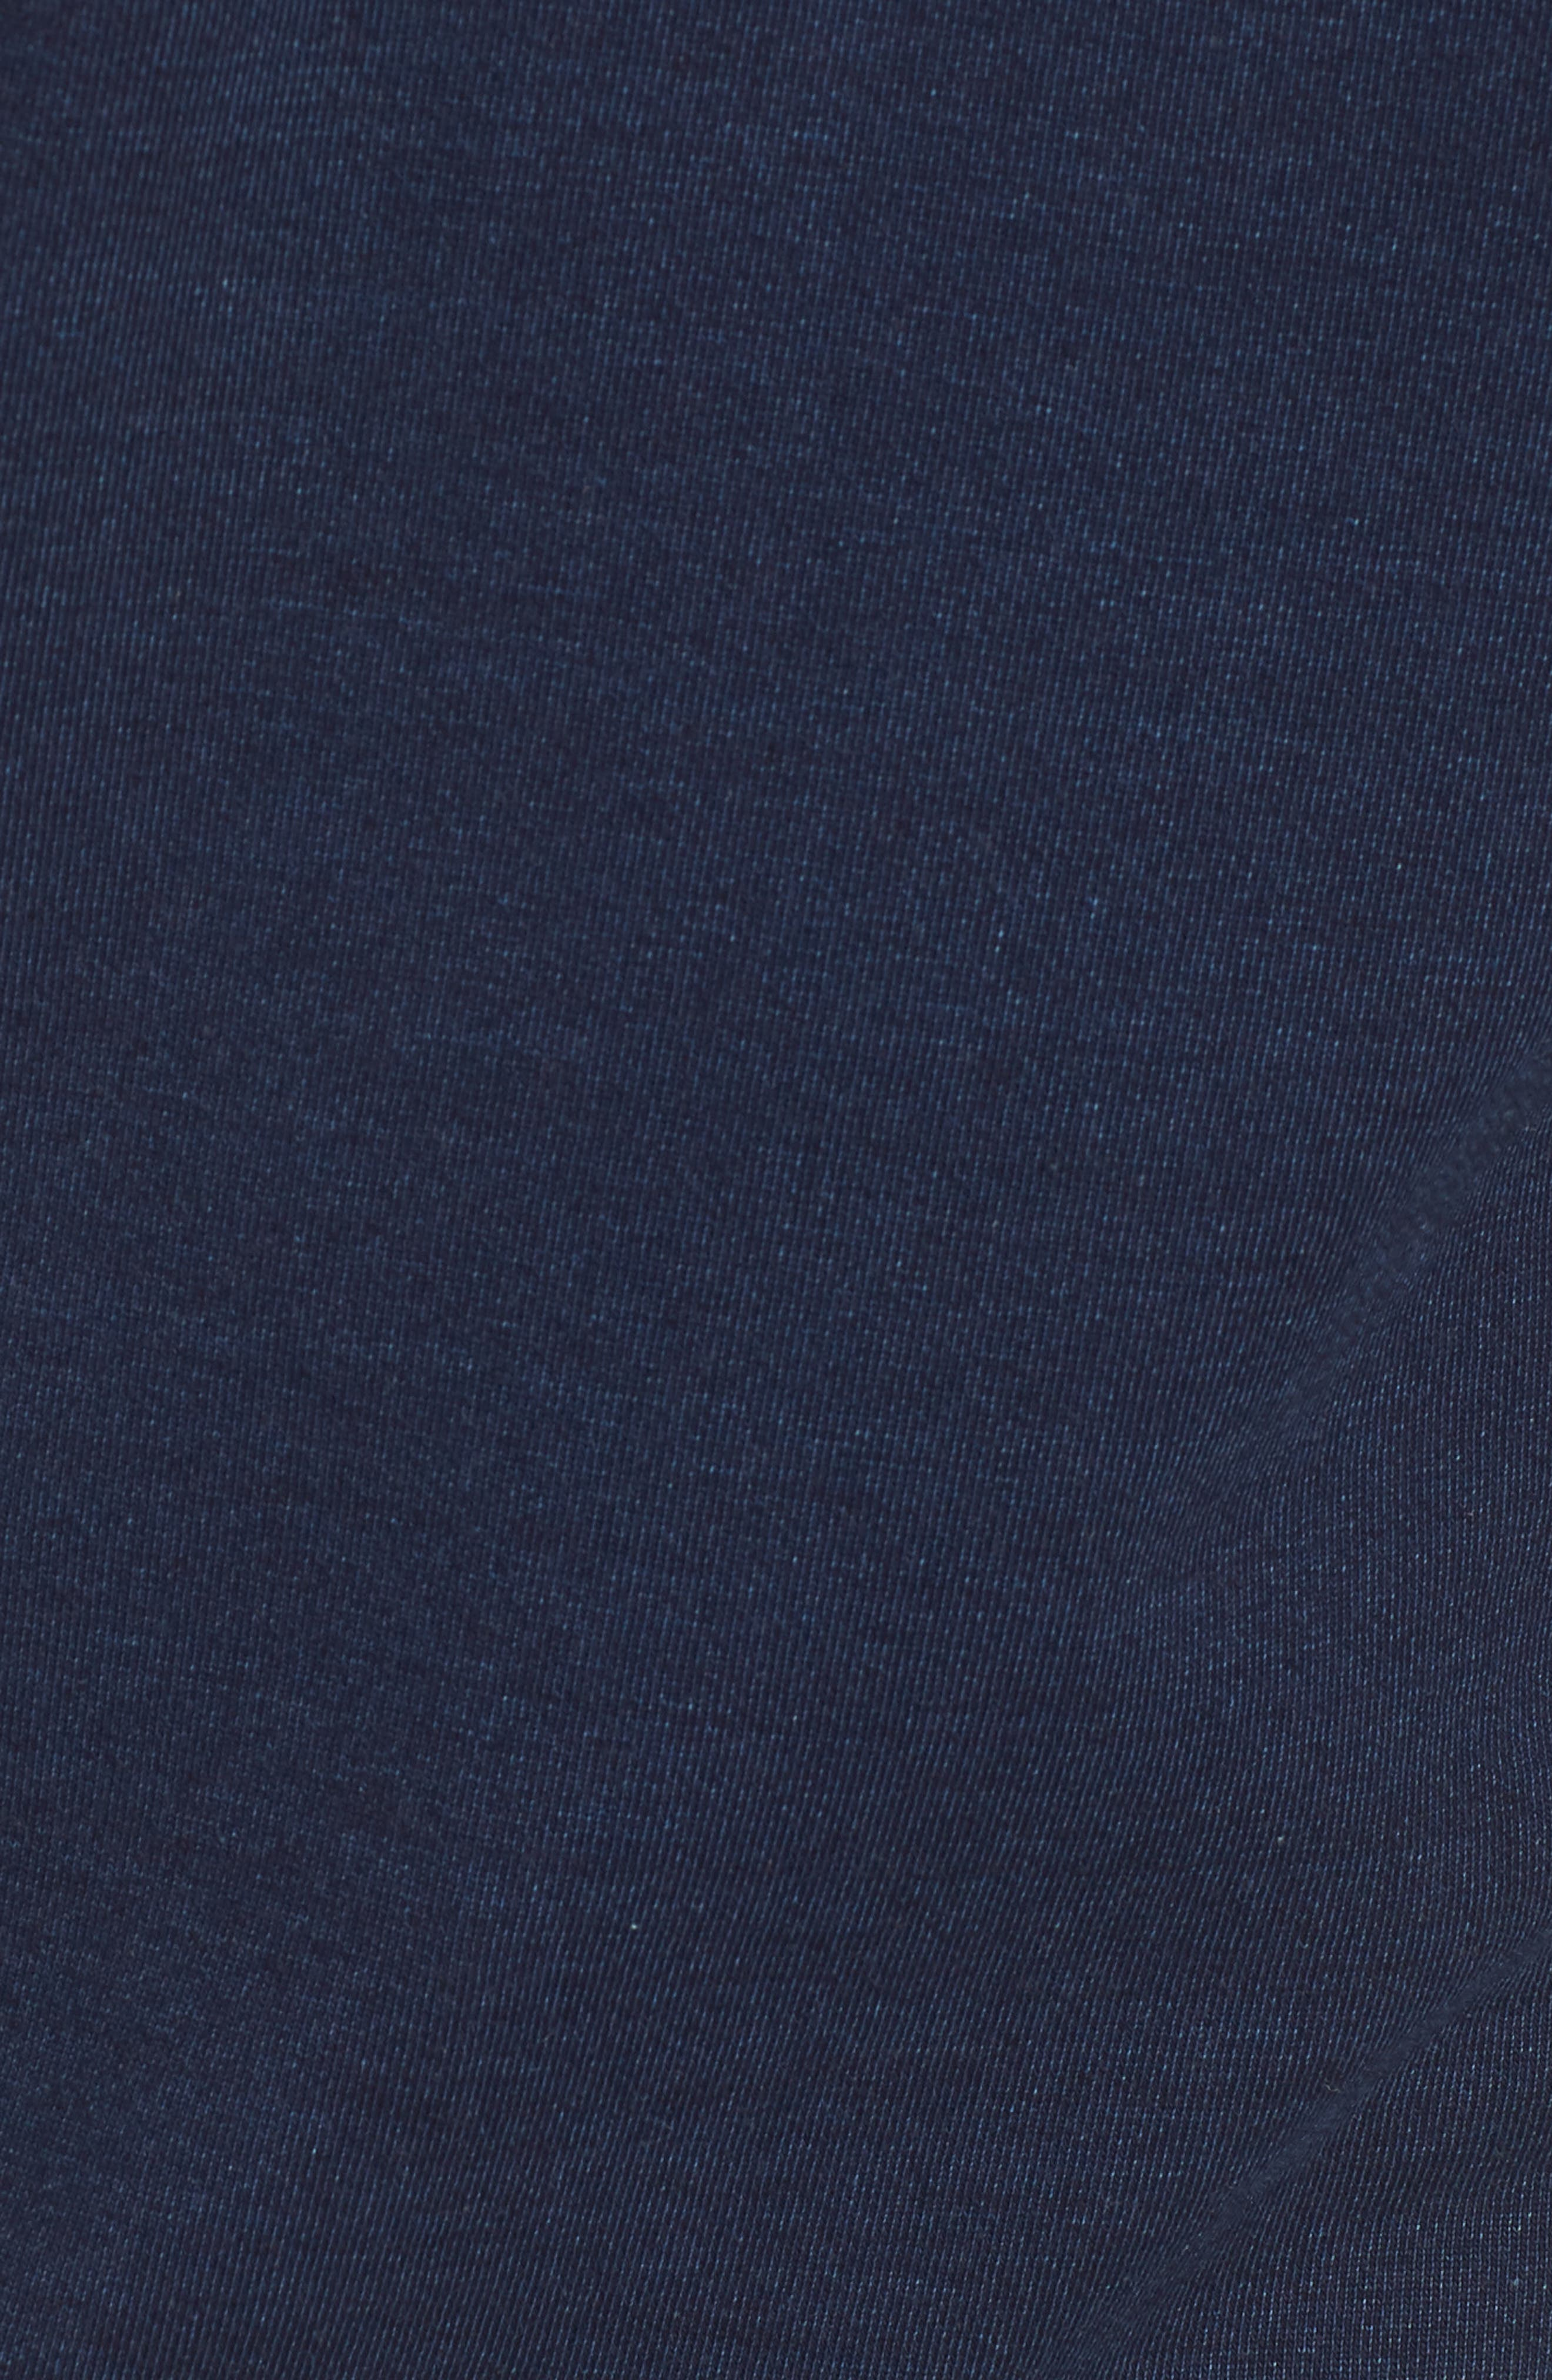 Gizi Cold Shoulder Sweatshirt,                             Alternate thumbnail 6, color,                             489